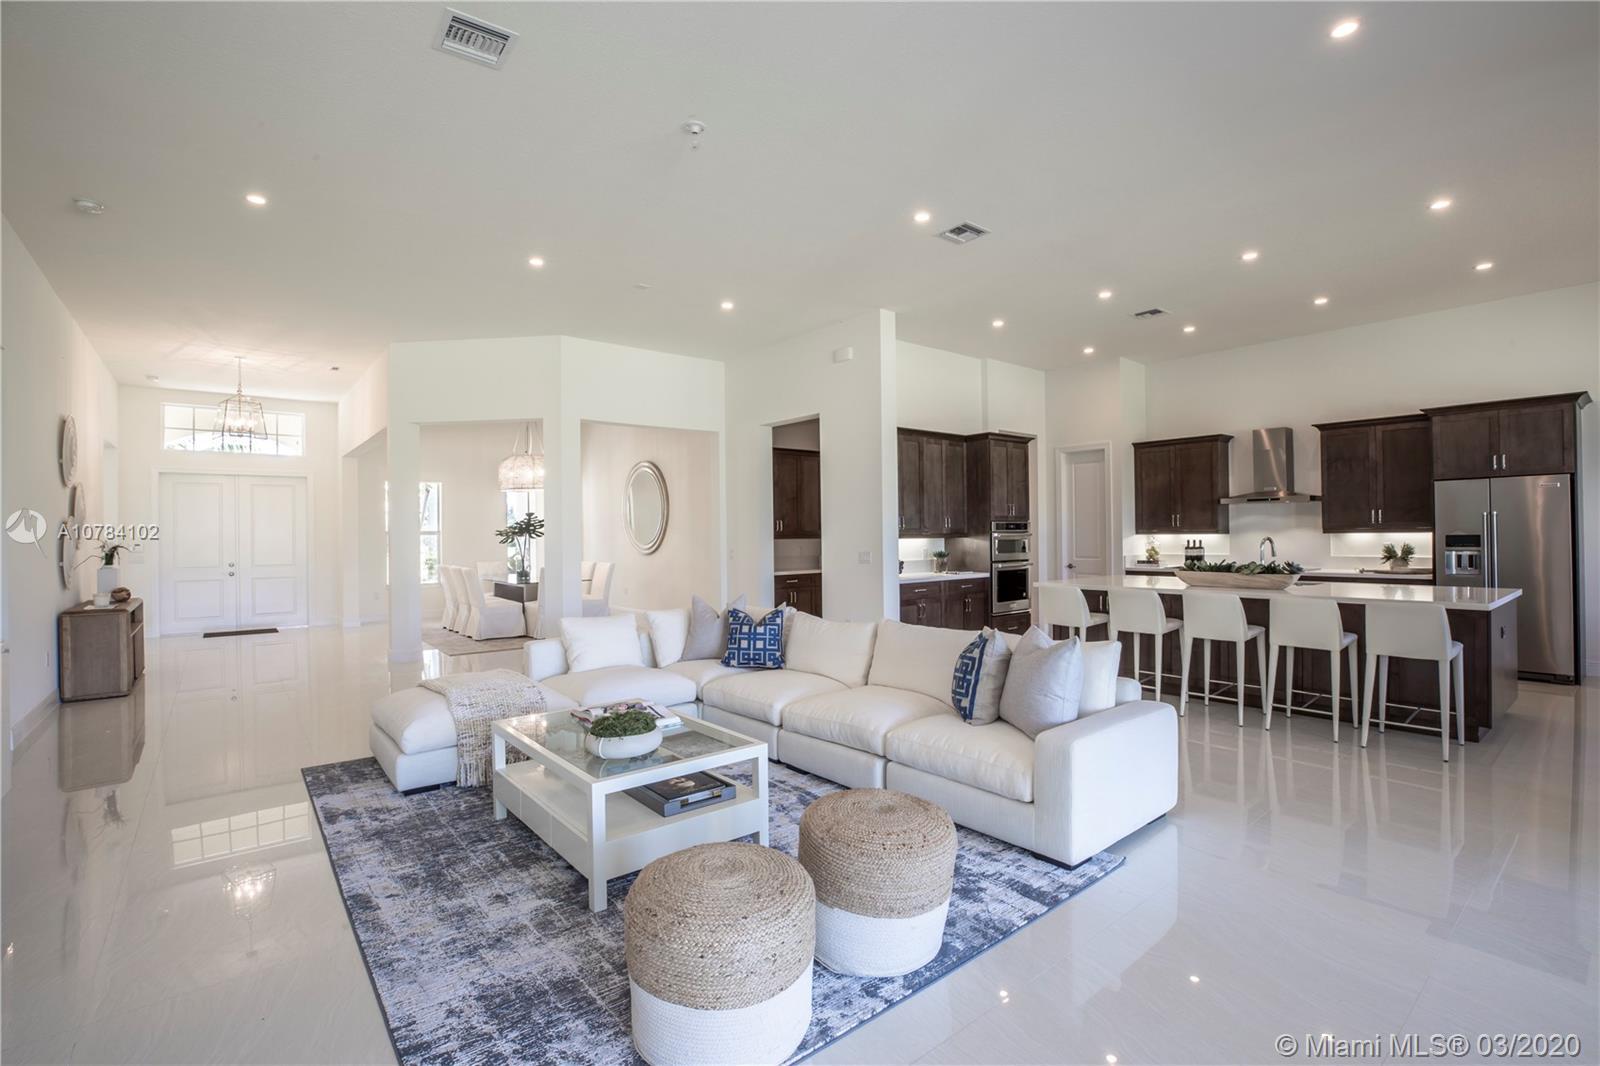 7425 Moorhen Ter, Lake Worth, FL 33463 - Lake Worth, FL real estate listing